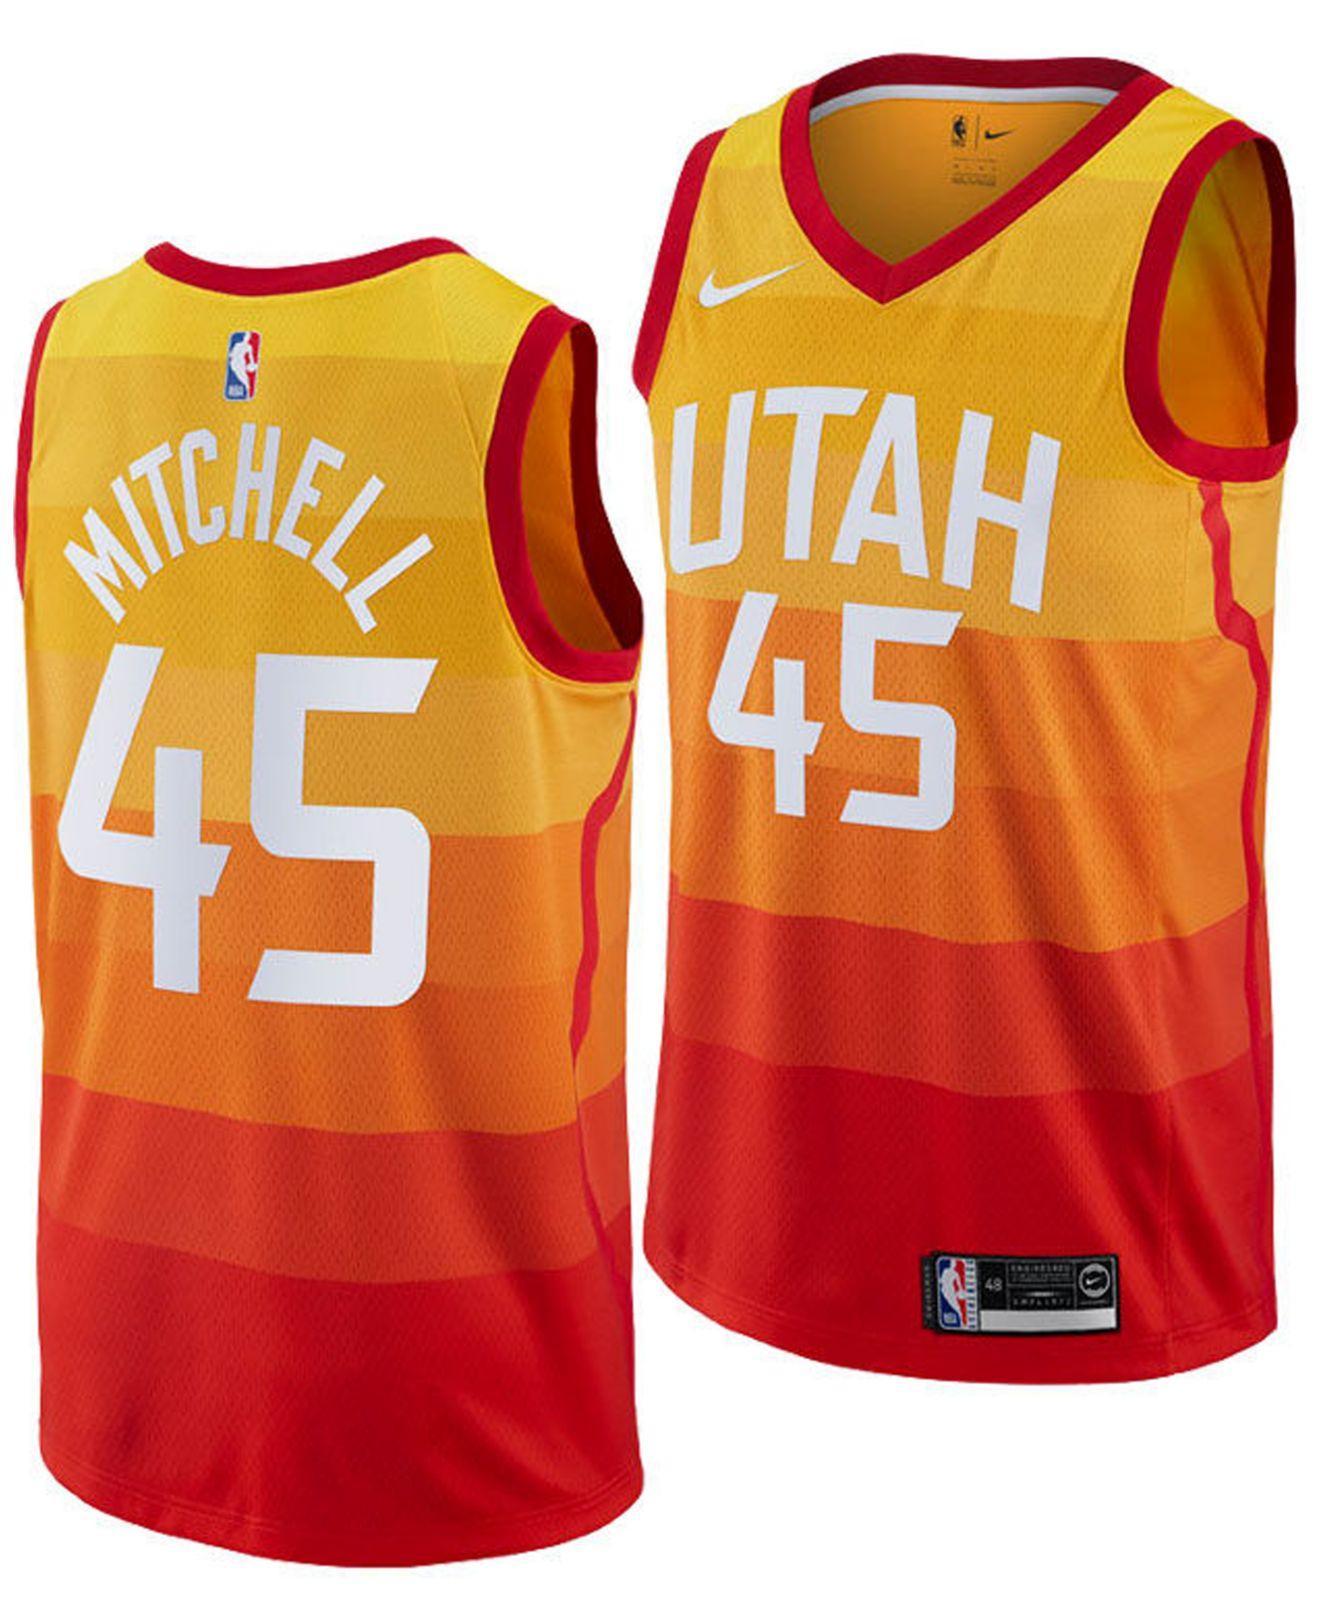 08f6b5528 Nike - Yellow Donovan Mitchell Utah Jazz City Swingman Jersey 2018 for Men  - Lyst. View fullscreen